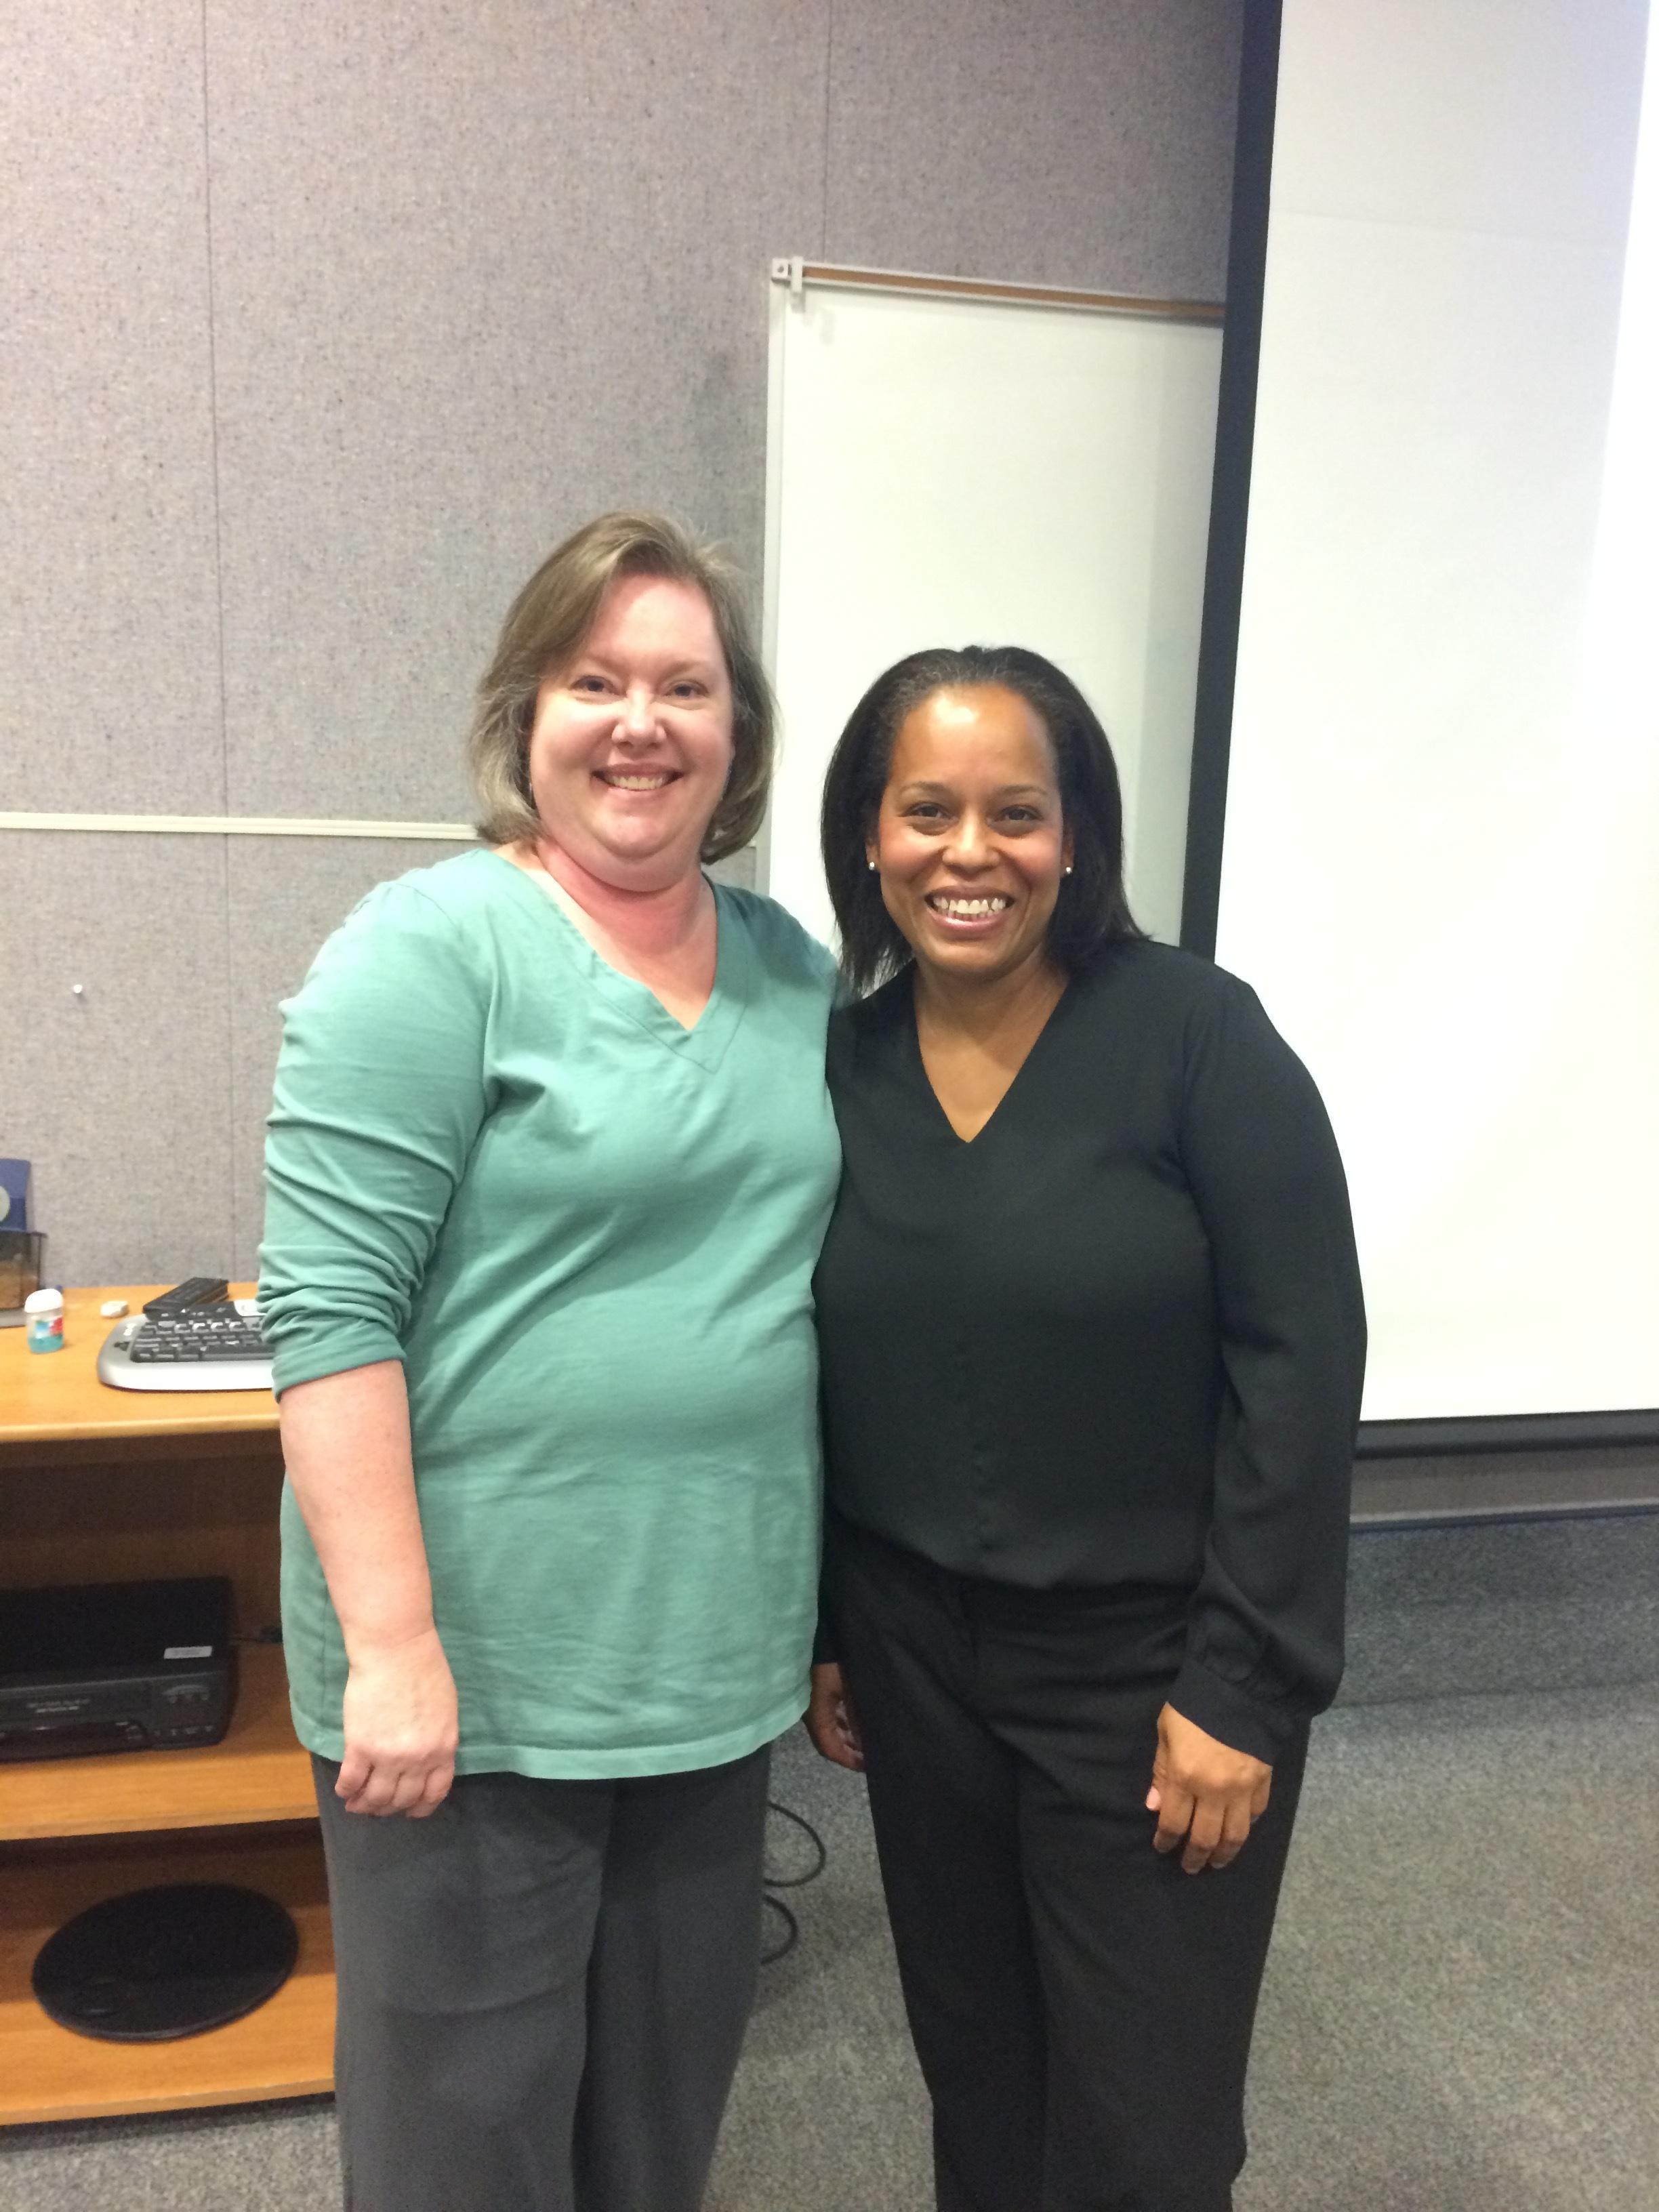 Foreign Language instructor Lori Pierce and US Foreign Service Diplomat Kali Jones.